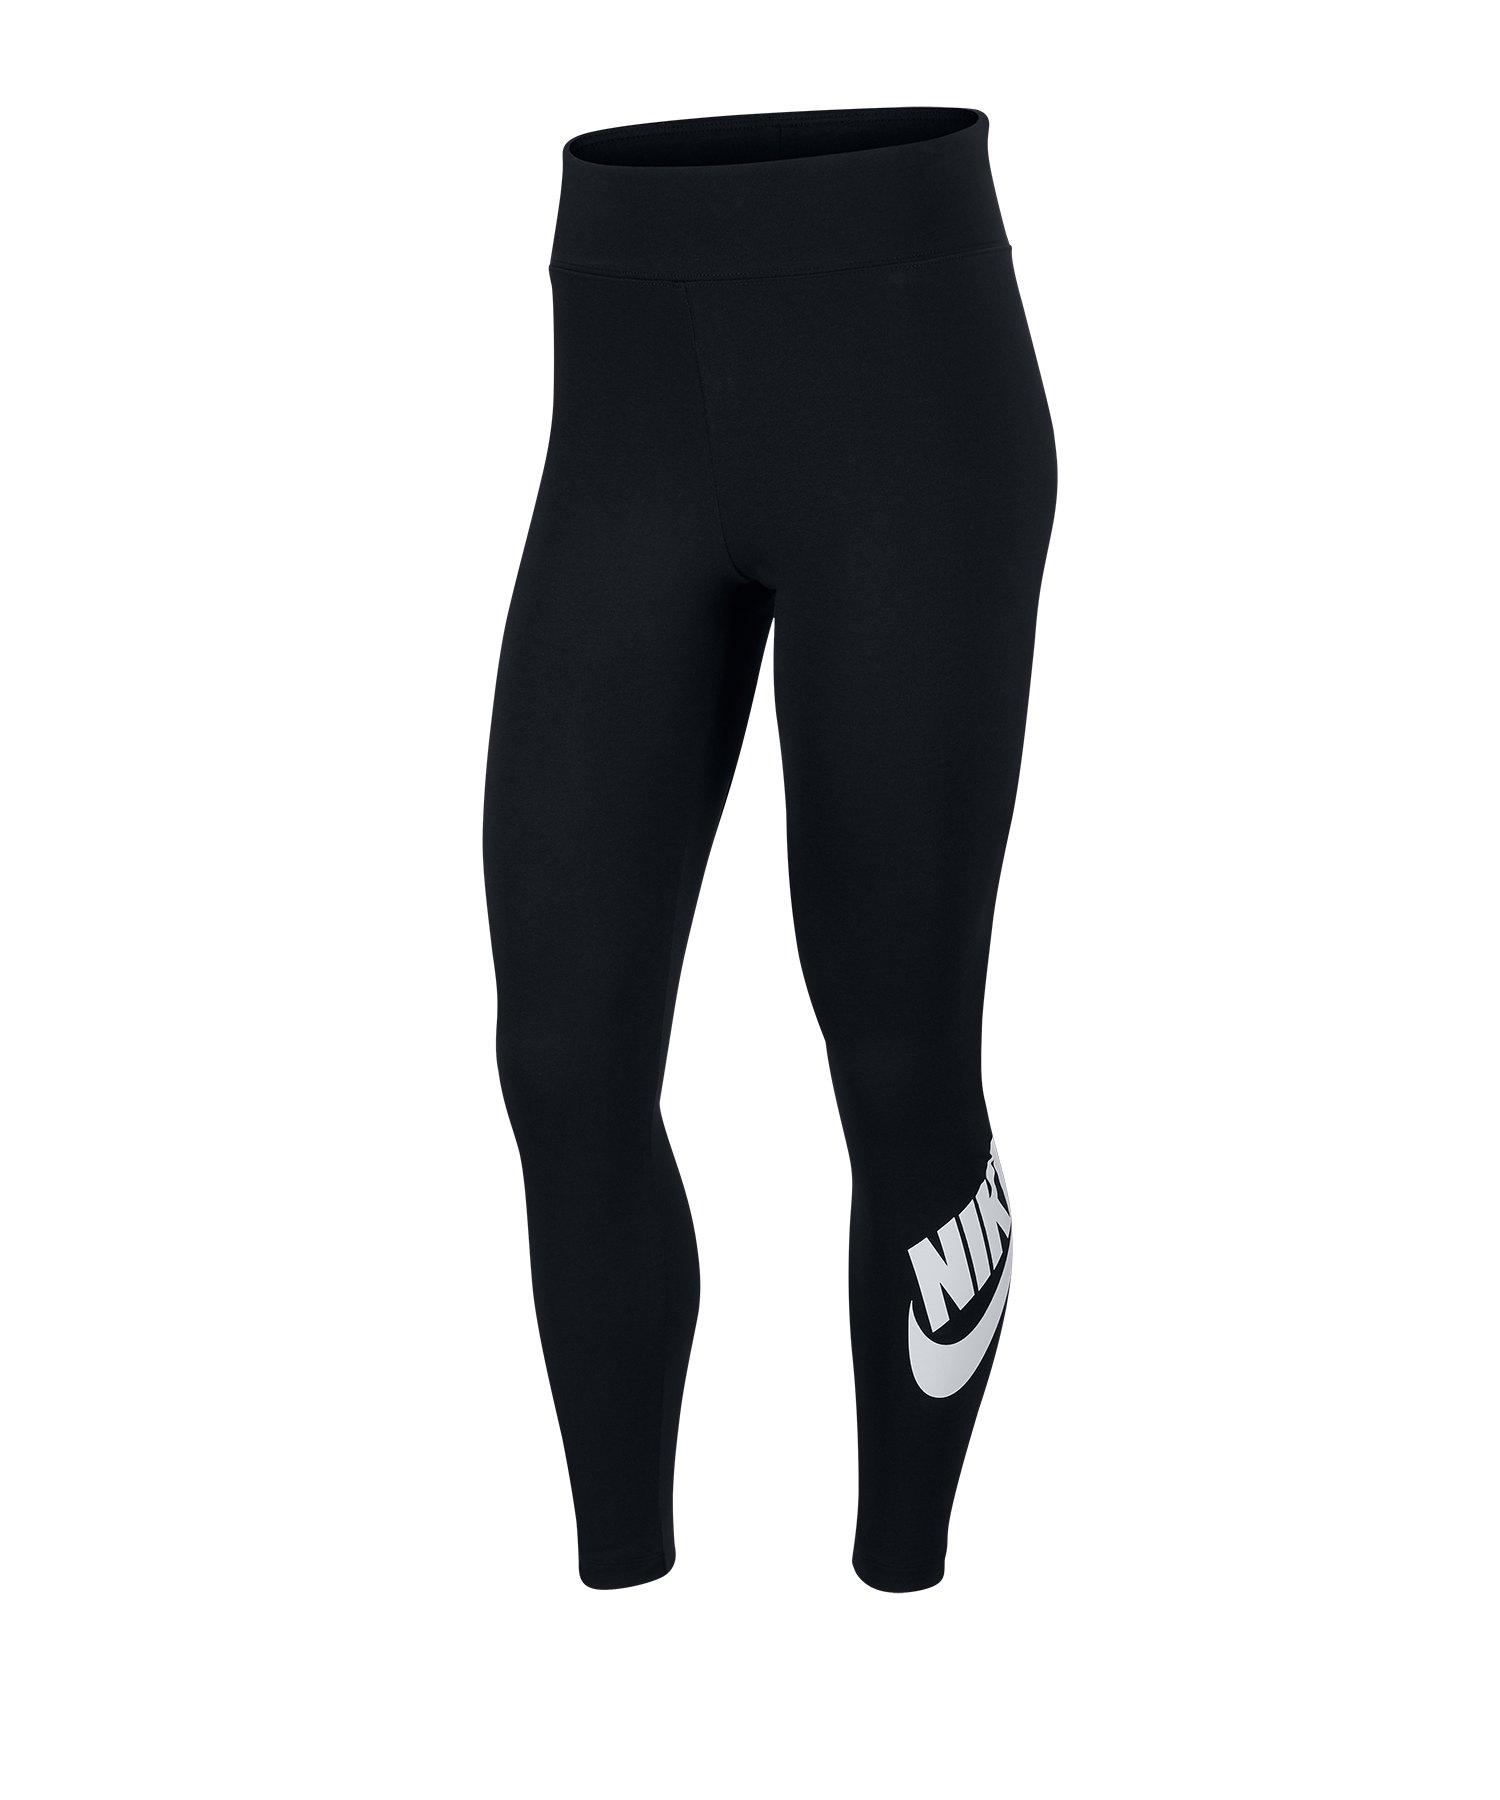 Nike Leg-A-See High Waisted Leggings Schwarz F011 - schwarz